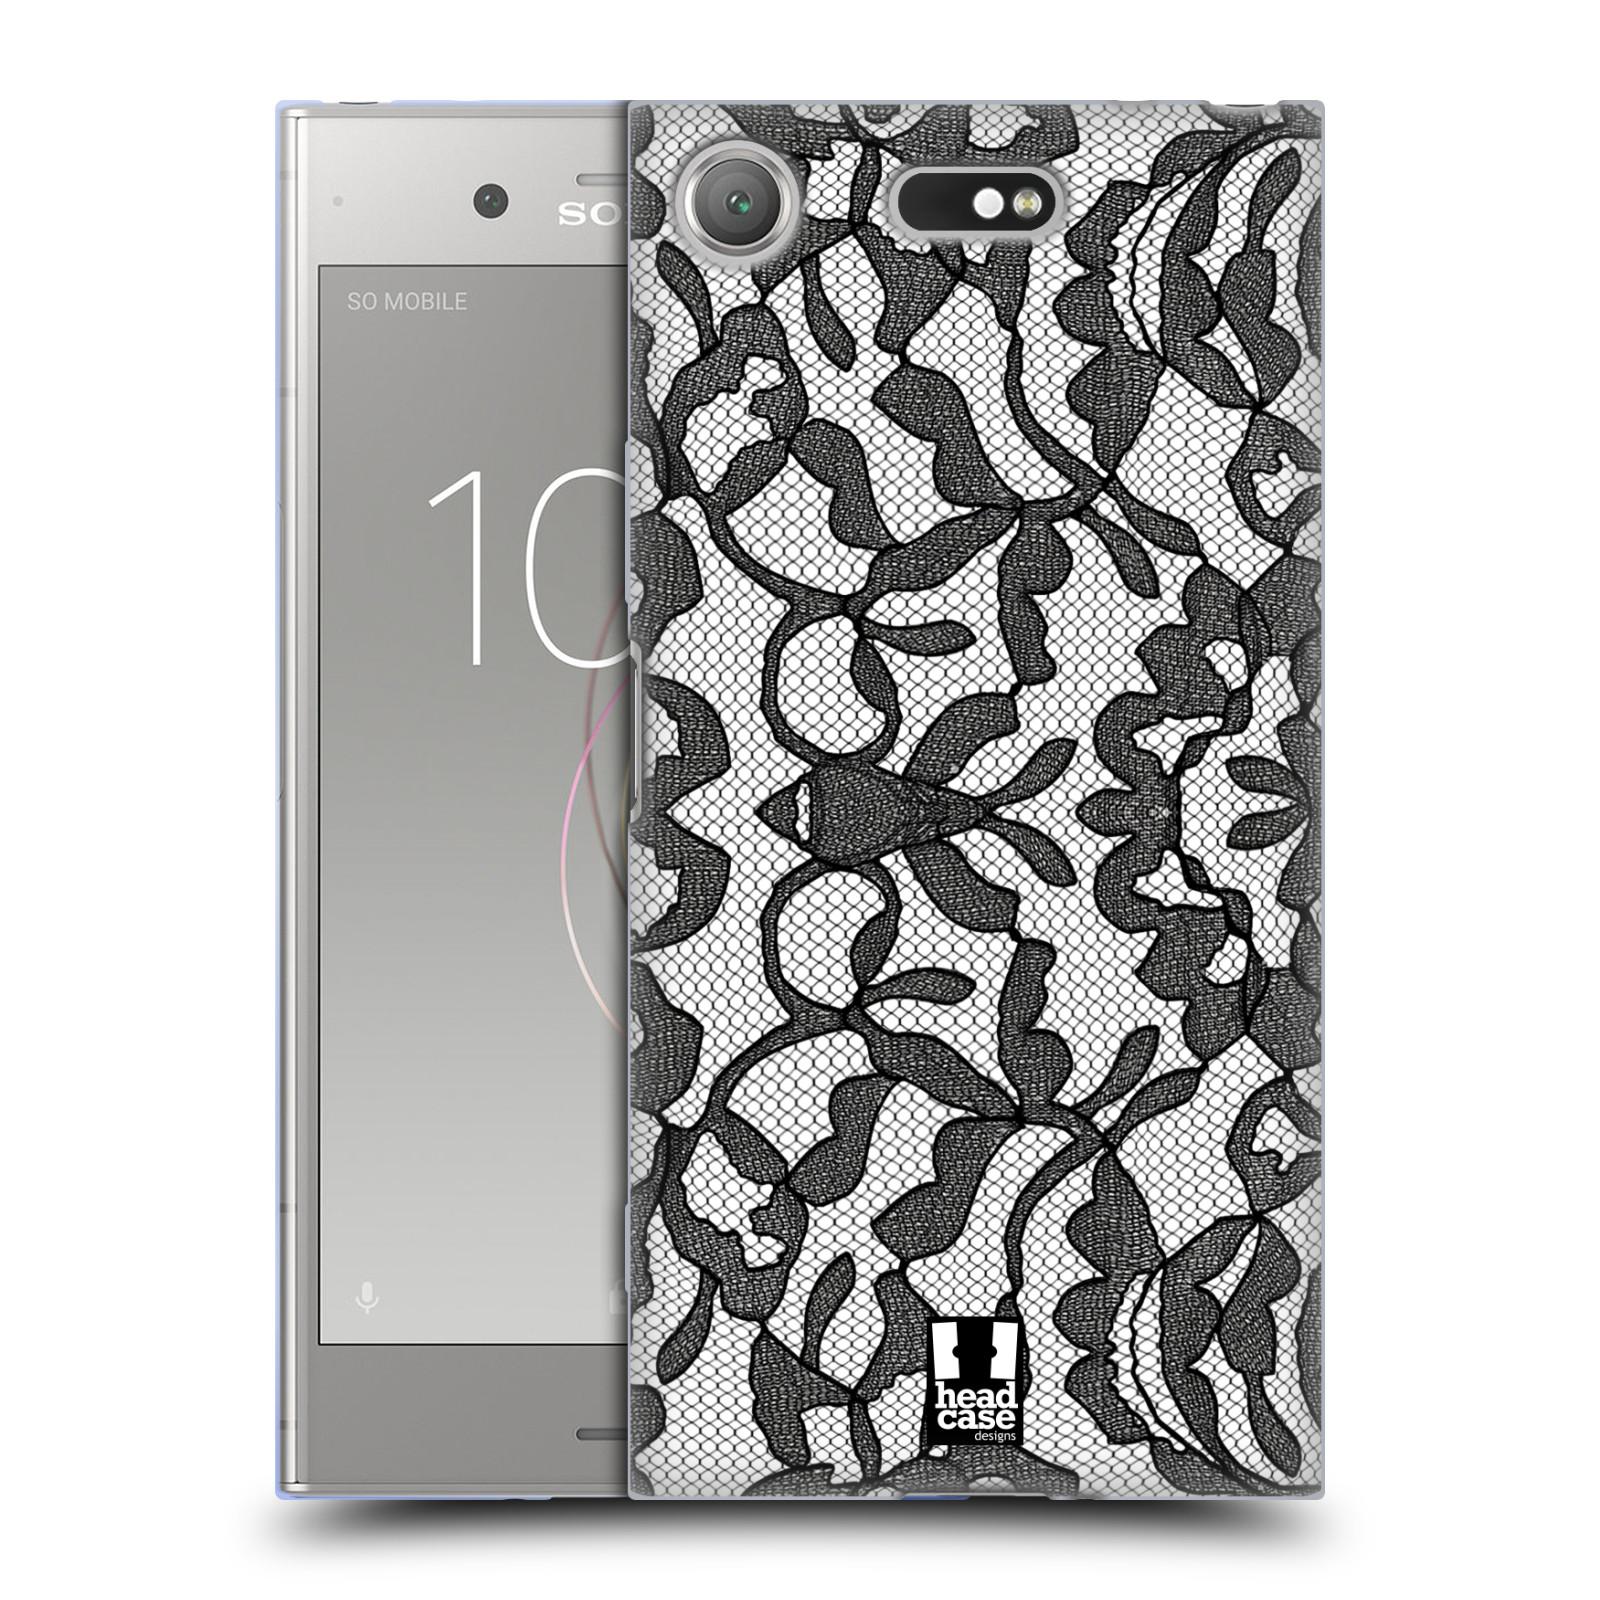 Silikonové pouzdro na mobil Sony Xperia XZ1 Compact - Head Case - LEAFY KRAJKA